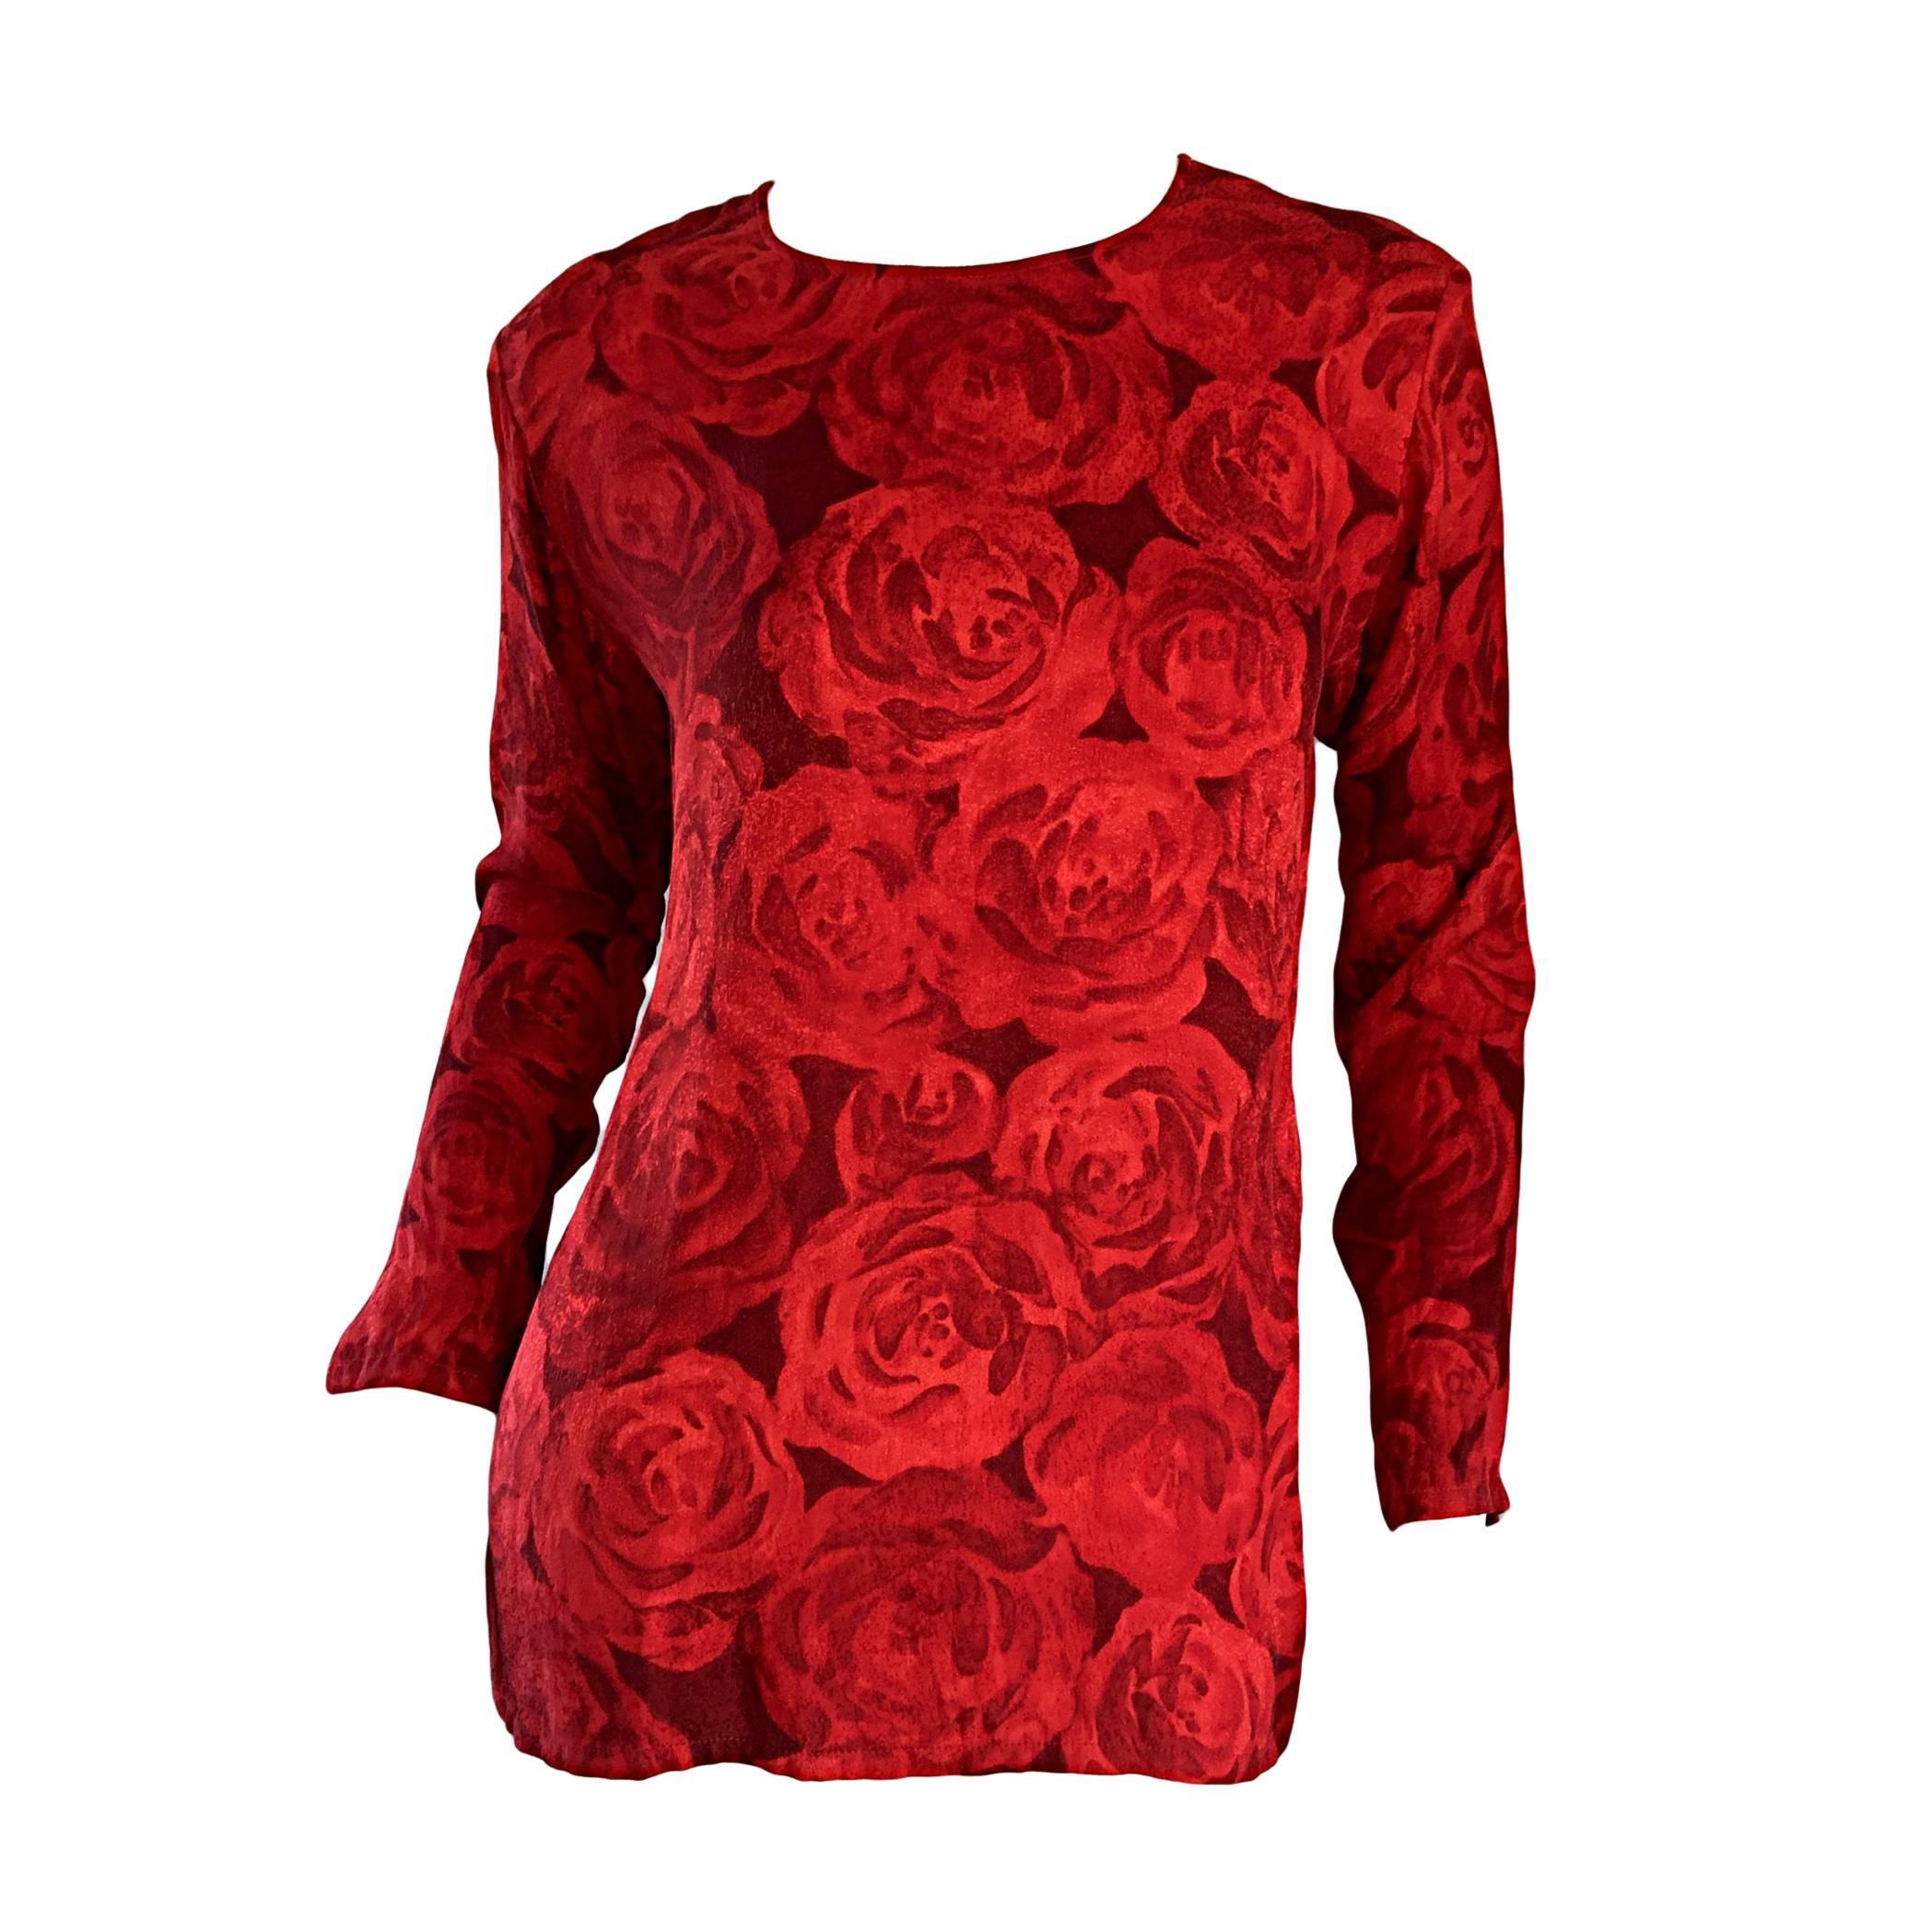 Vintage Yves Saint Laurent YSL ' Rive Gauche ' Rose Print Silk Blouse Top